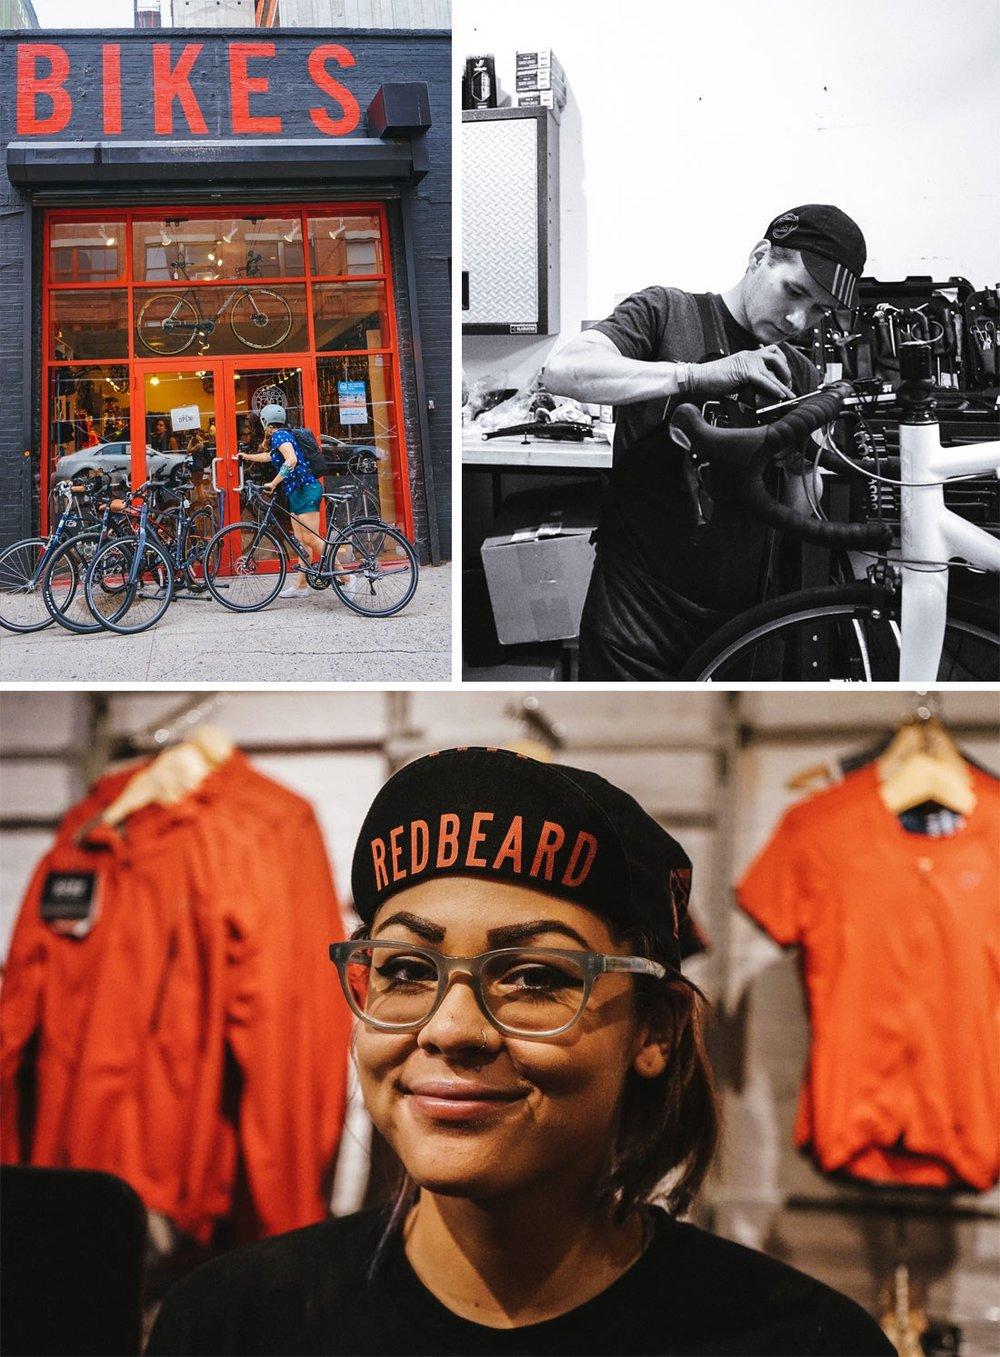 NYCbyBike_redbeardbikes.jpg